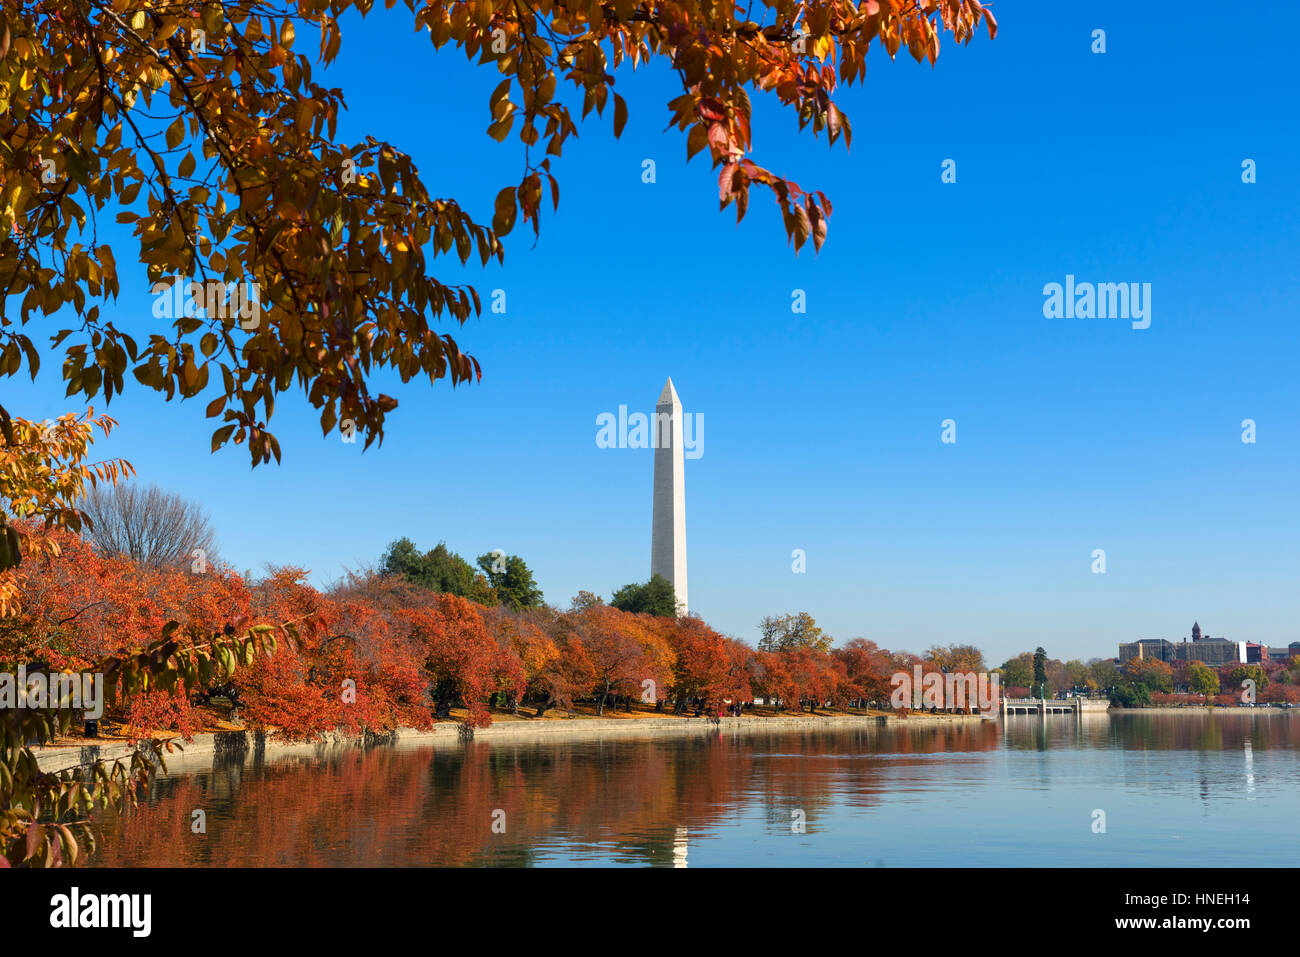 The Washington Monument from the Tidal Basin in the fall, West Potomac Park, Washington DC, USA Stock Photo